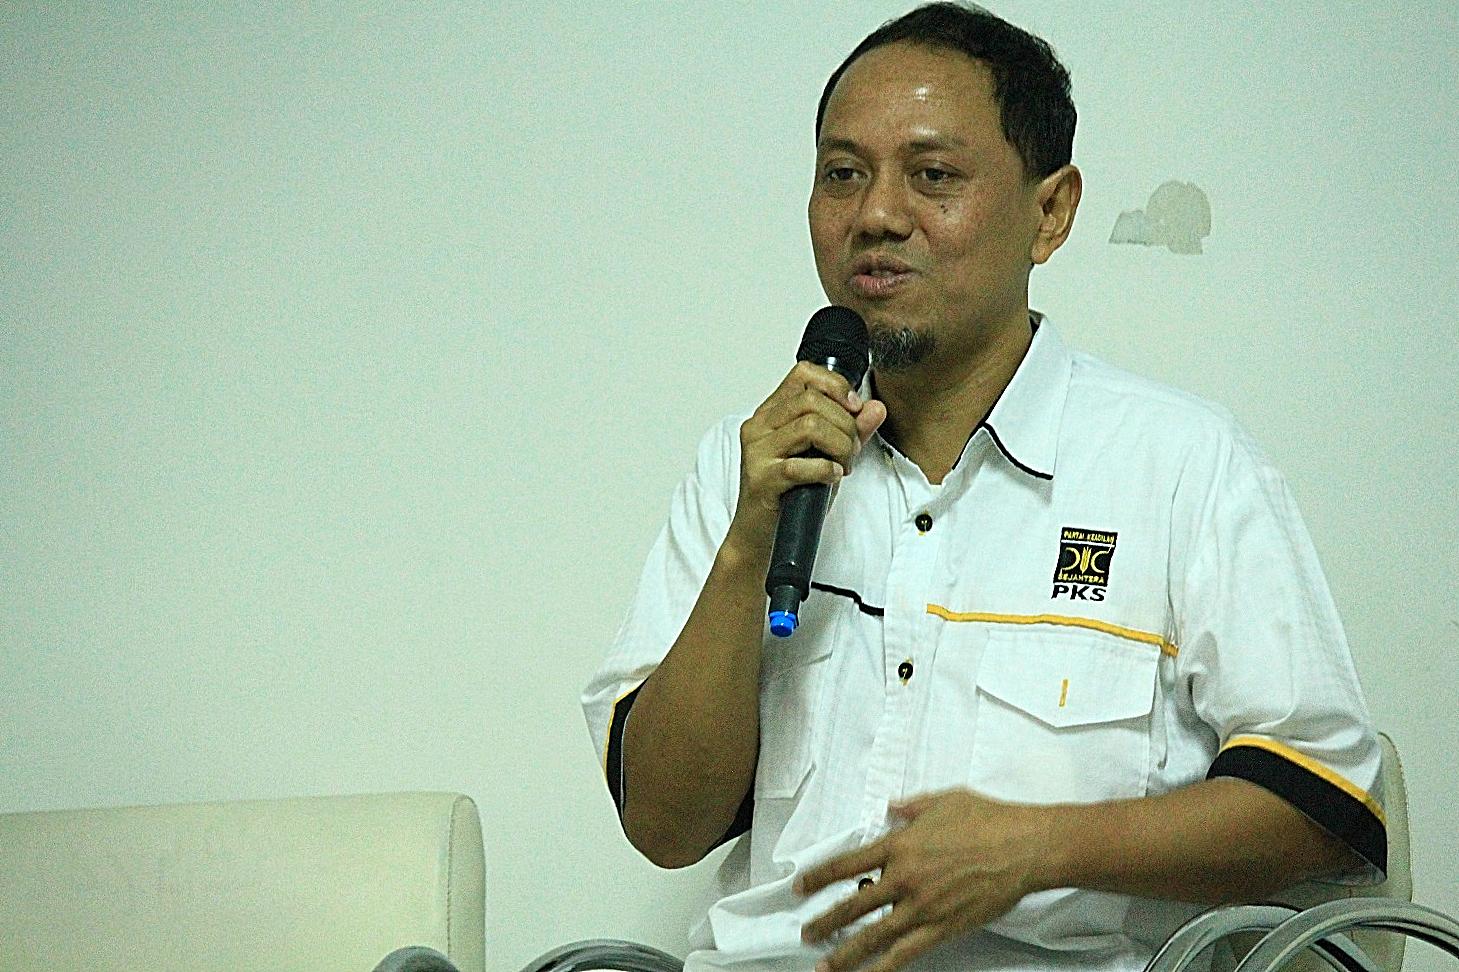 Sosialisasi PKS Muda DPW DKI Jkt_060817_ika (2)